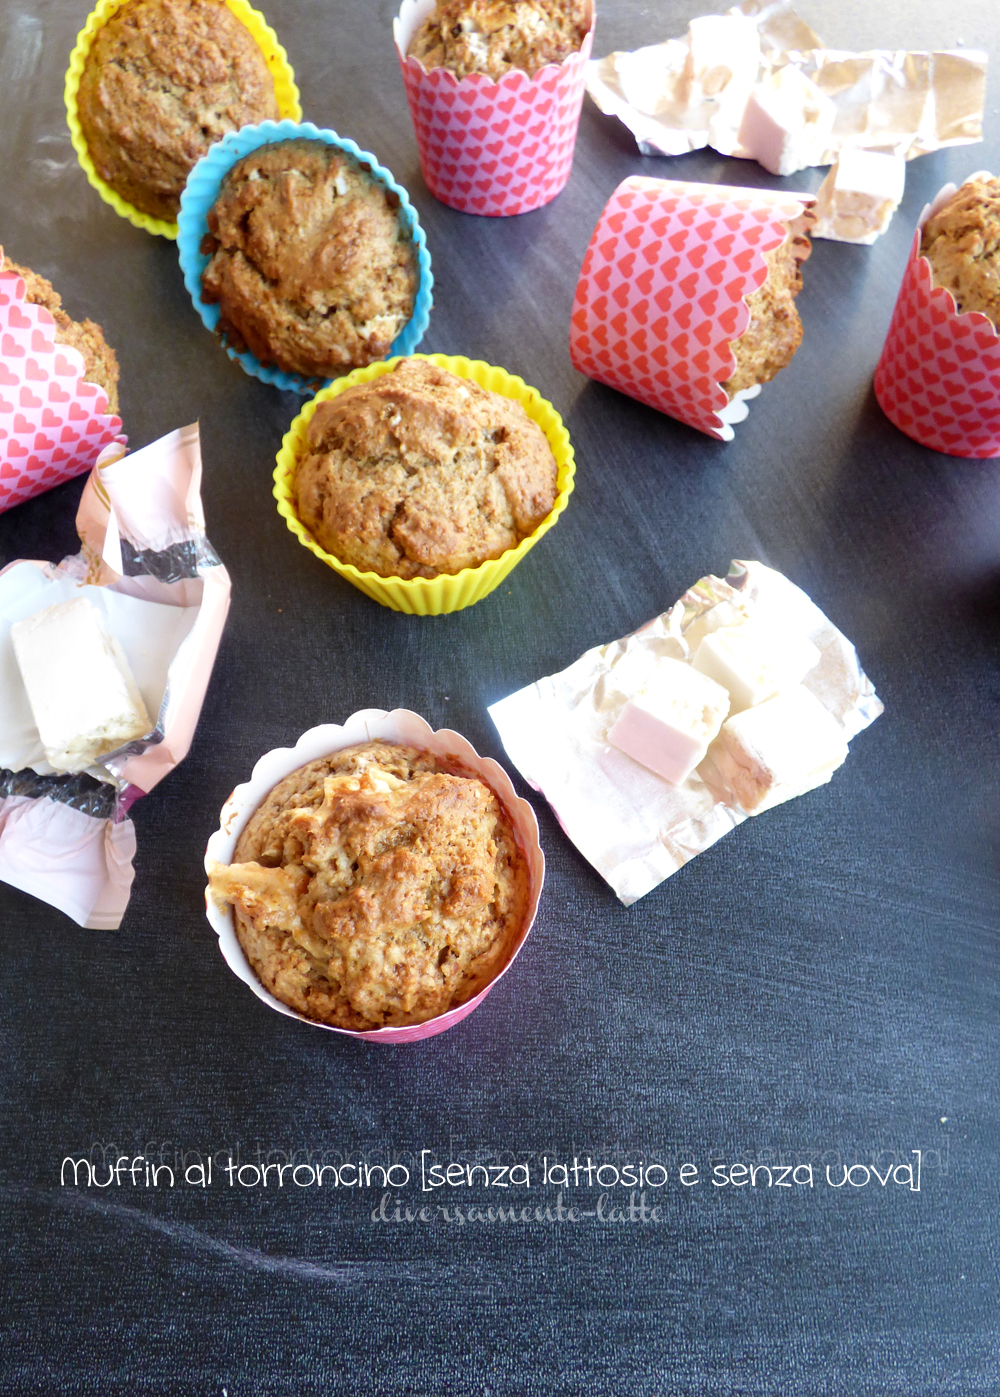 muffin al torroncino